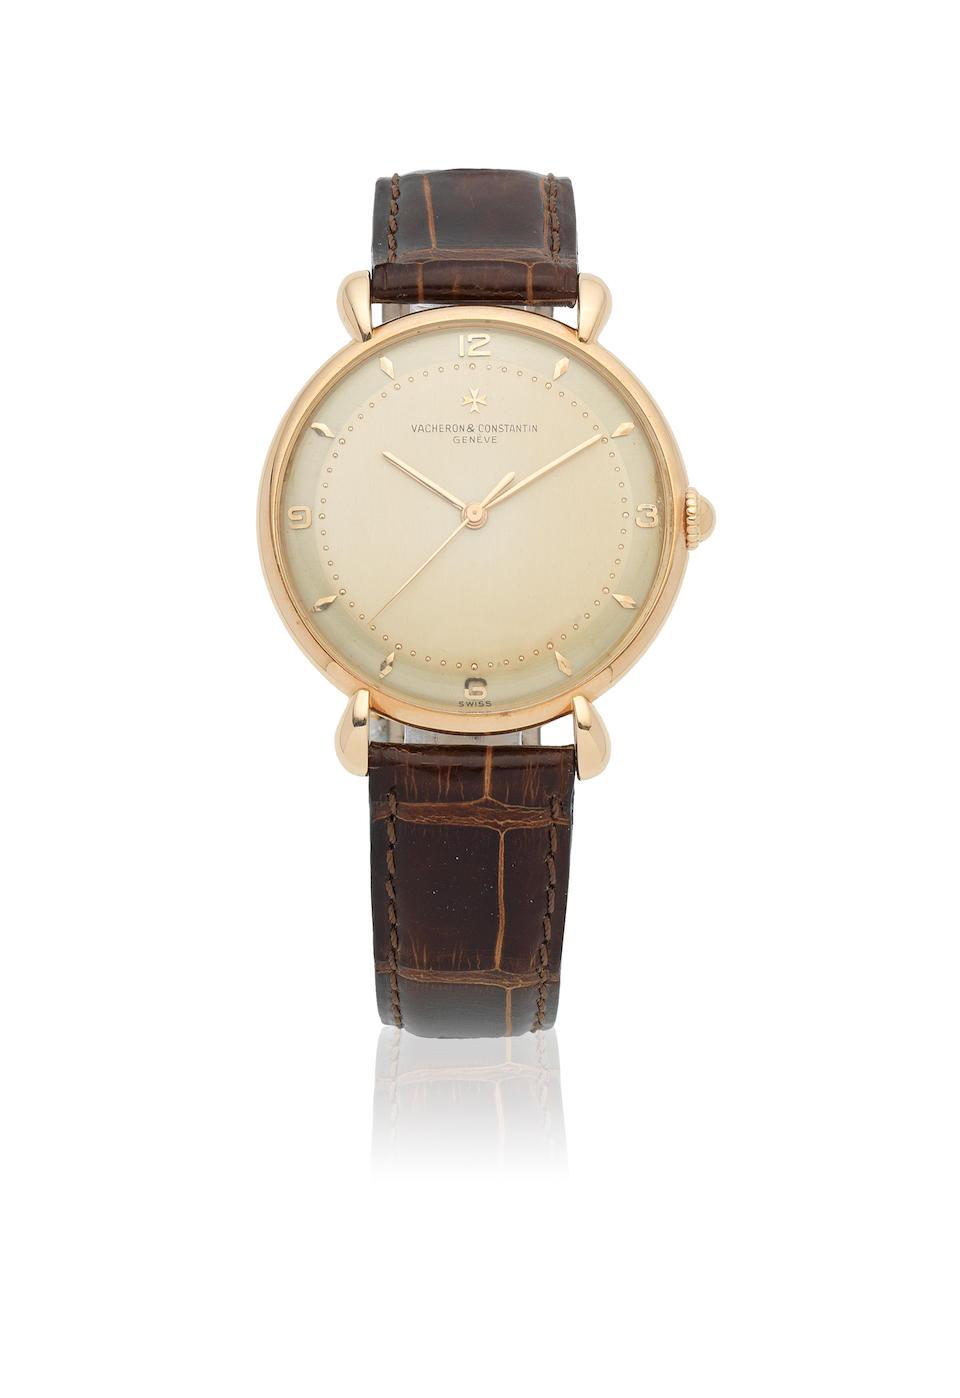 Vacheron & Constantin. An 18K rose gold manual wind wristwatch with teardrop lugs Ref: 4218, Circa 1950